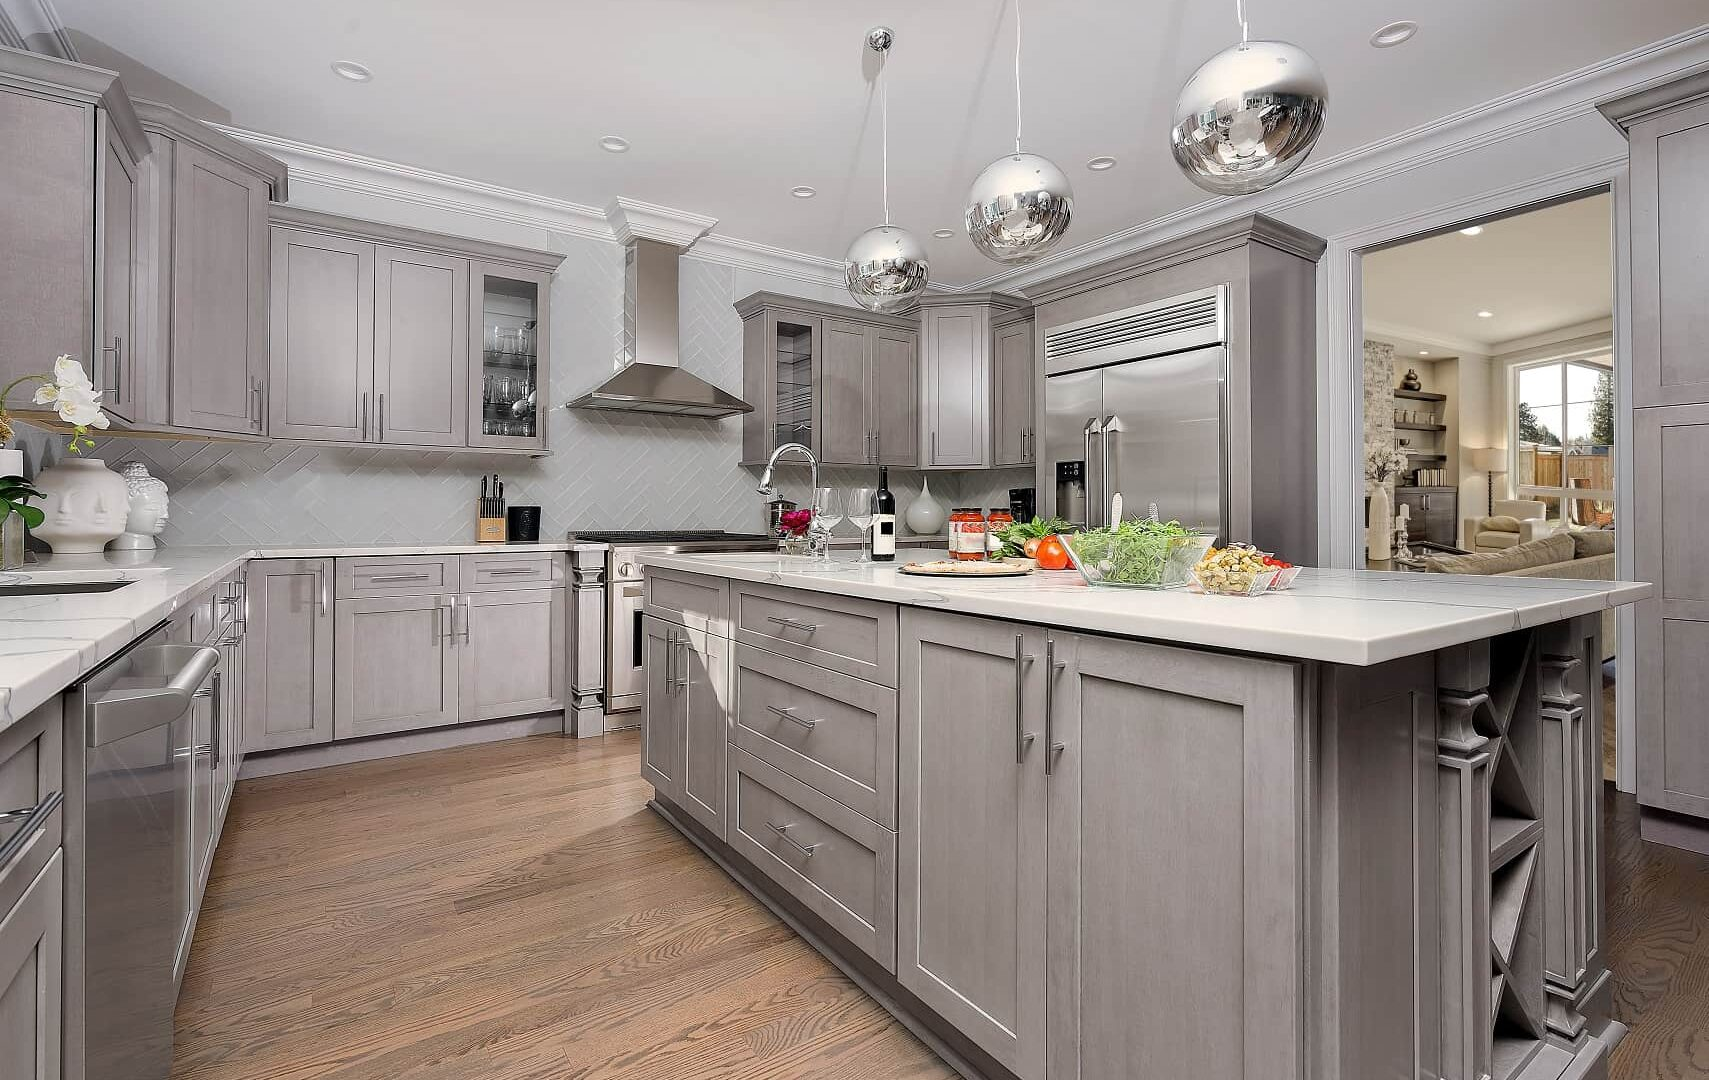 Kitchen Design, Kitchen Design Models, Kitchen Design Ideas, French, Tuscan, Restaurant, Inspiration, Black, U Shape, Backsplash, Italian